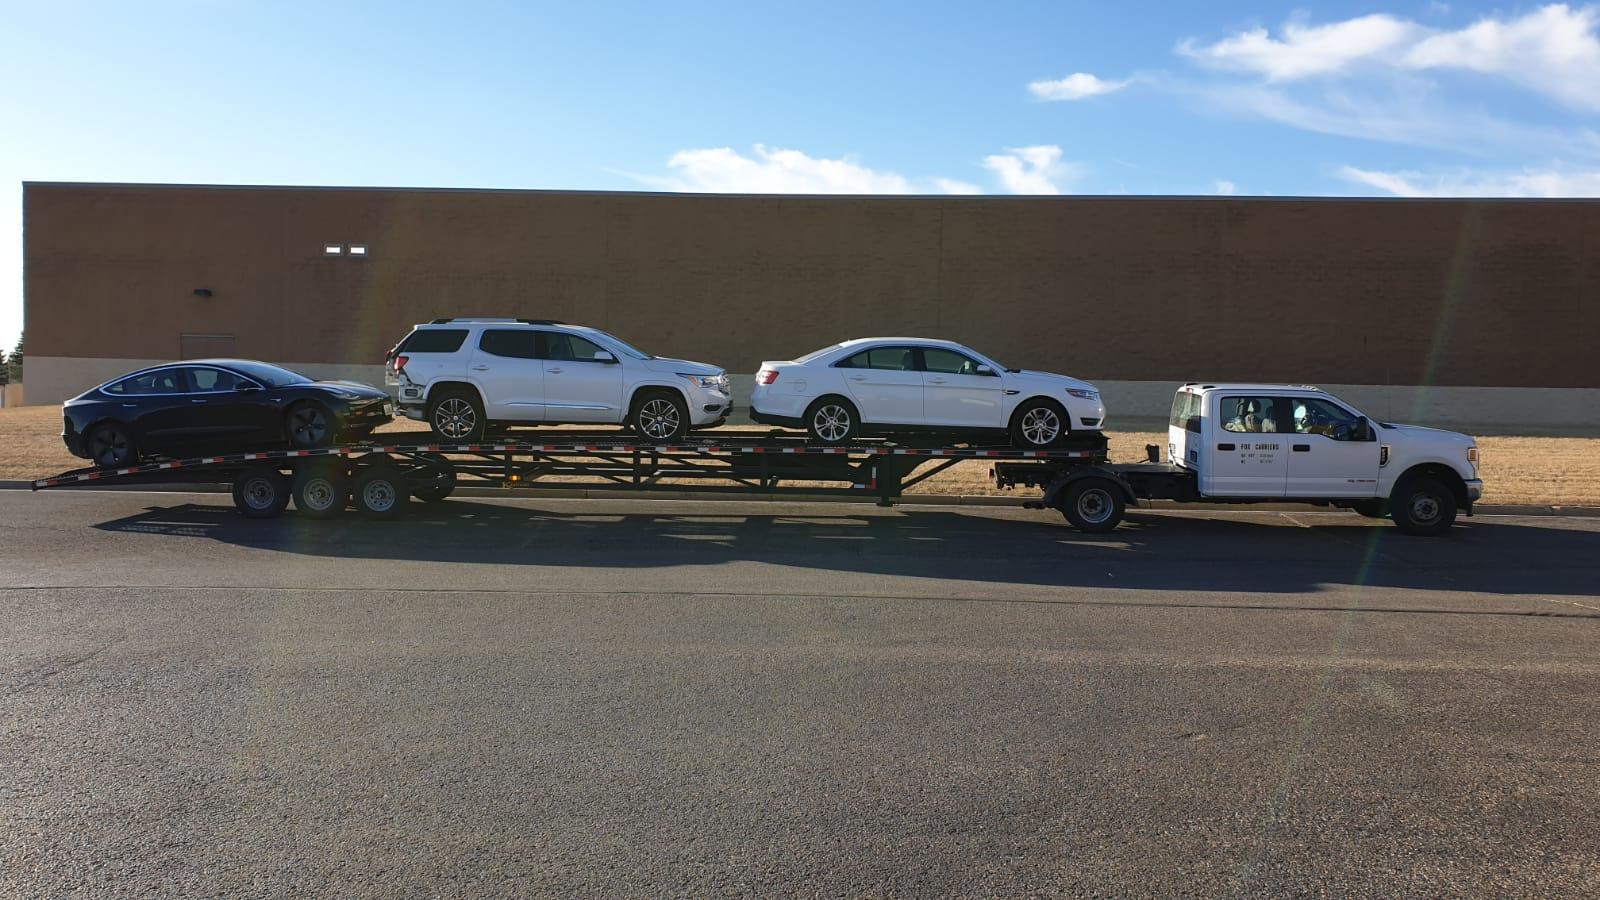 Oregon vehicle transportation service